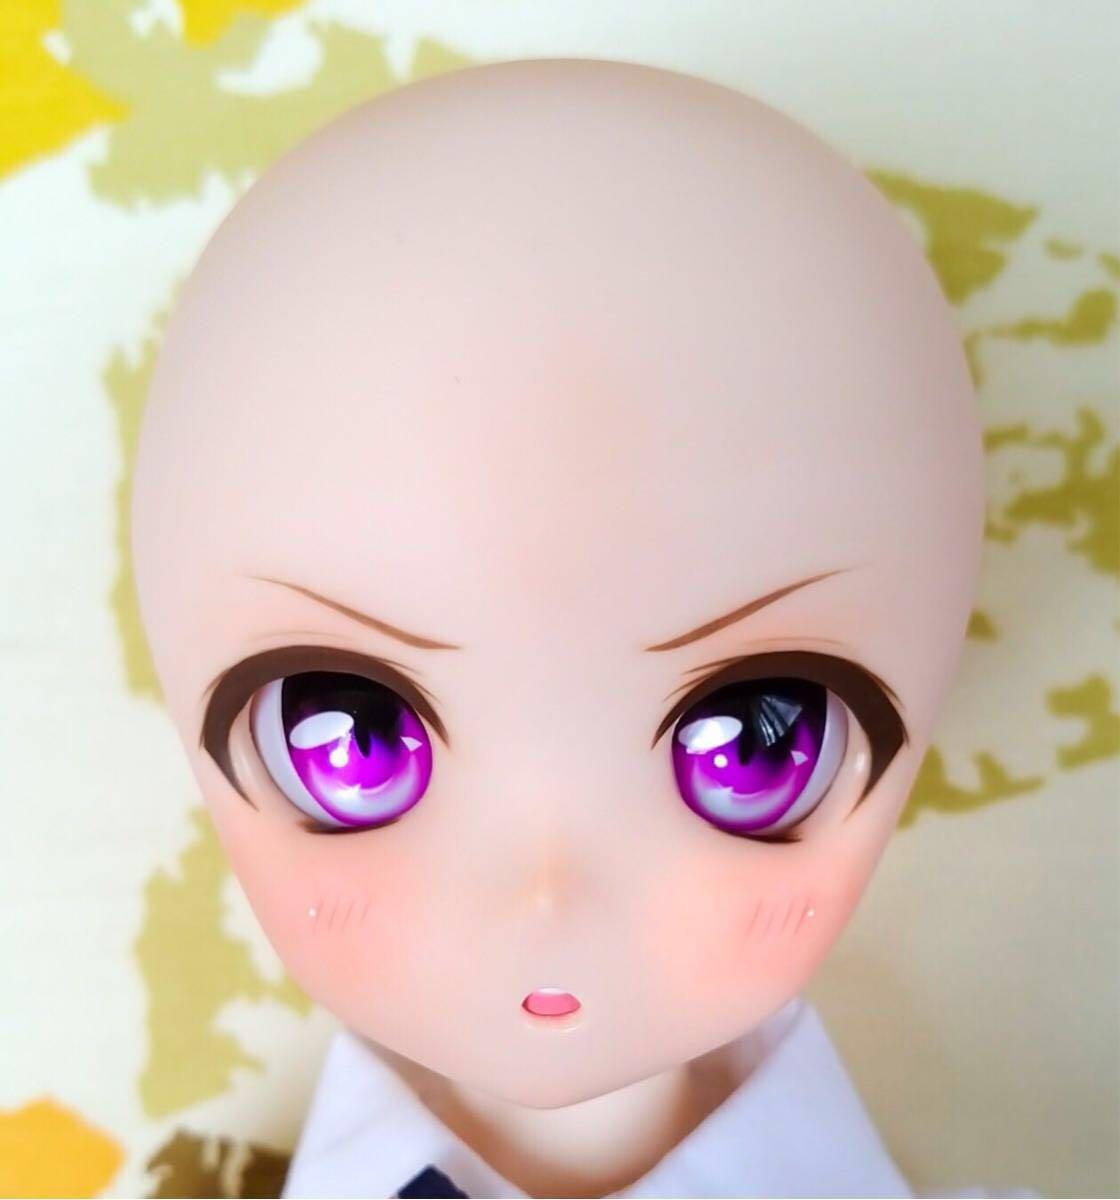 【Cube。】No.59 DDH-01 ノーマル肌 カスタムヘッド+アイ_画像10